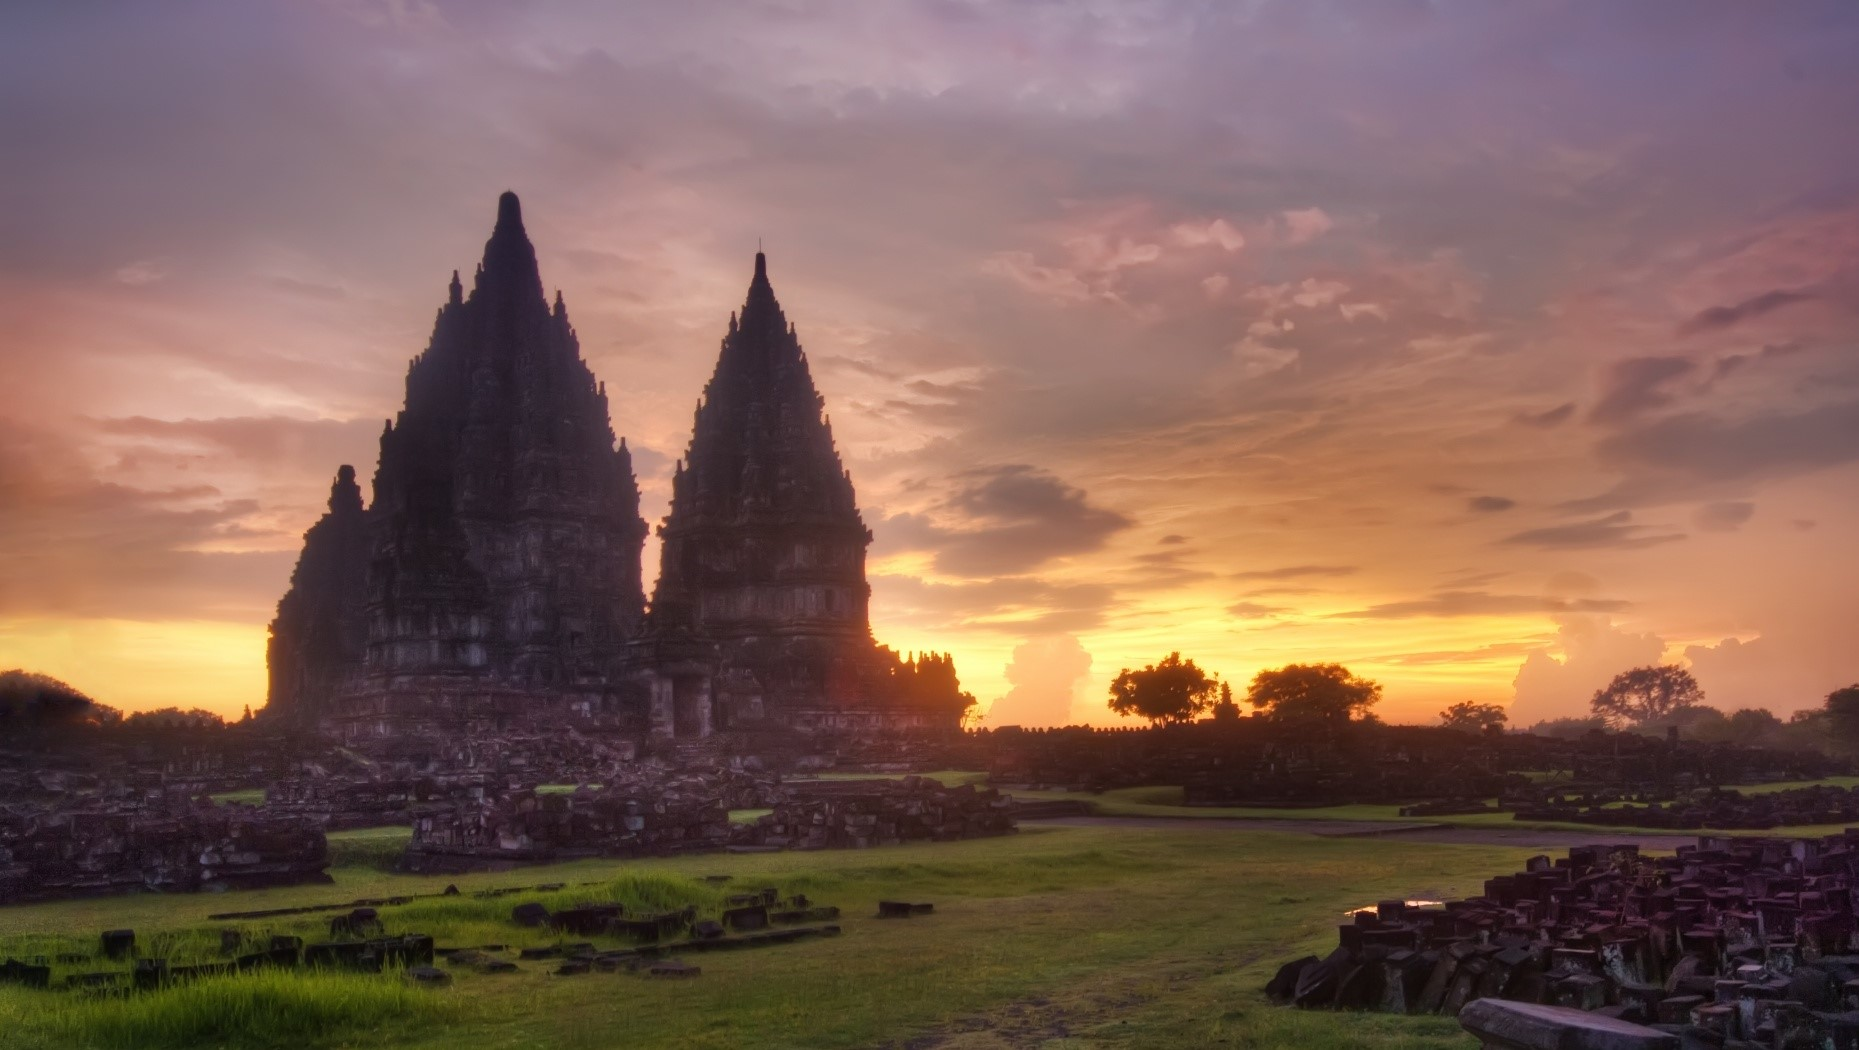 Prambanan Candi Hindu Wisata Yogyakarta Pesona Objek Perbatasan Jogja Klaten